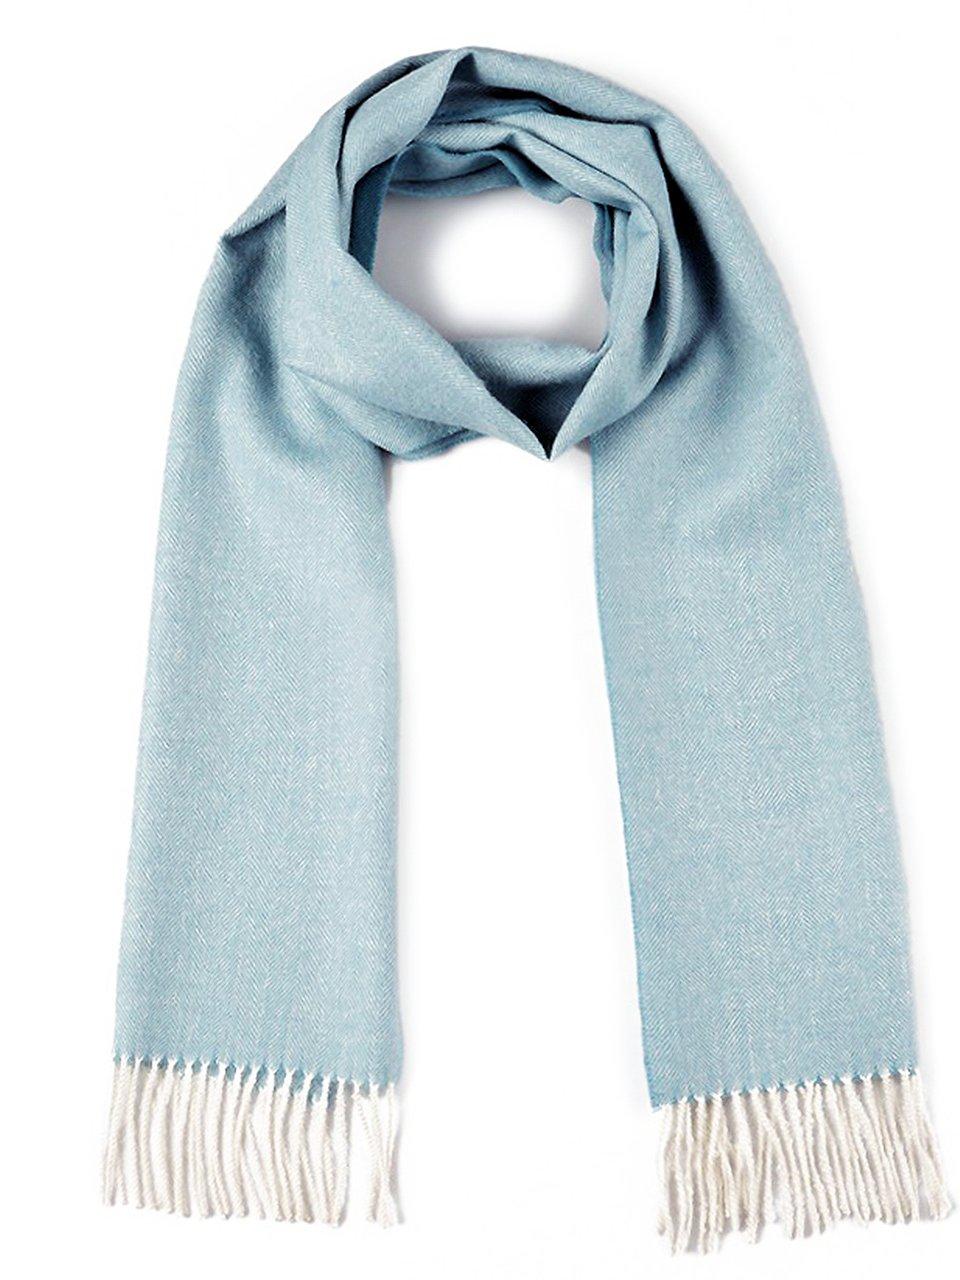 Herringbone Alpaca Scarf - 100% Baby Alpaca (Light Blue Herringbone)